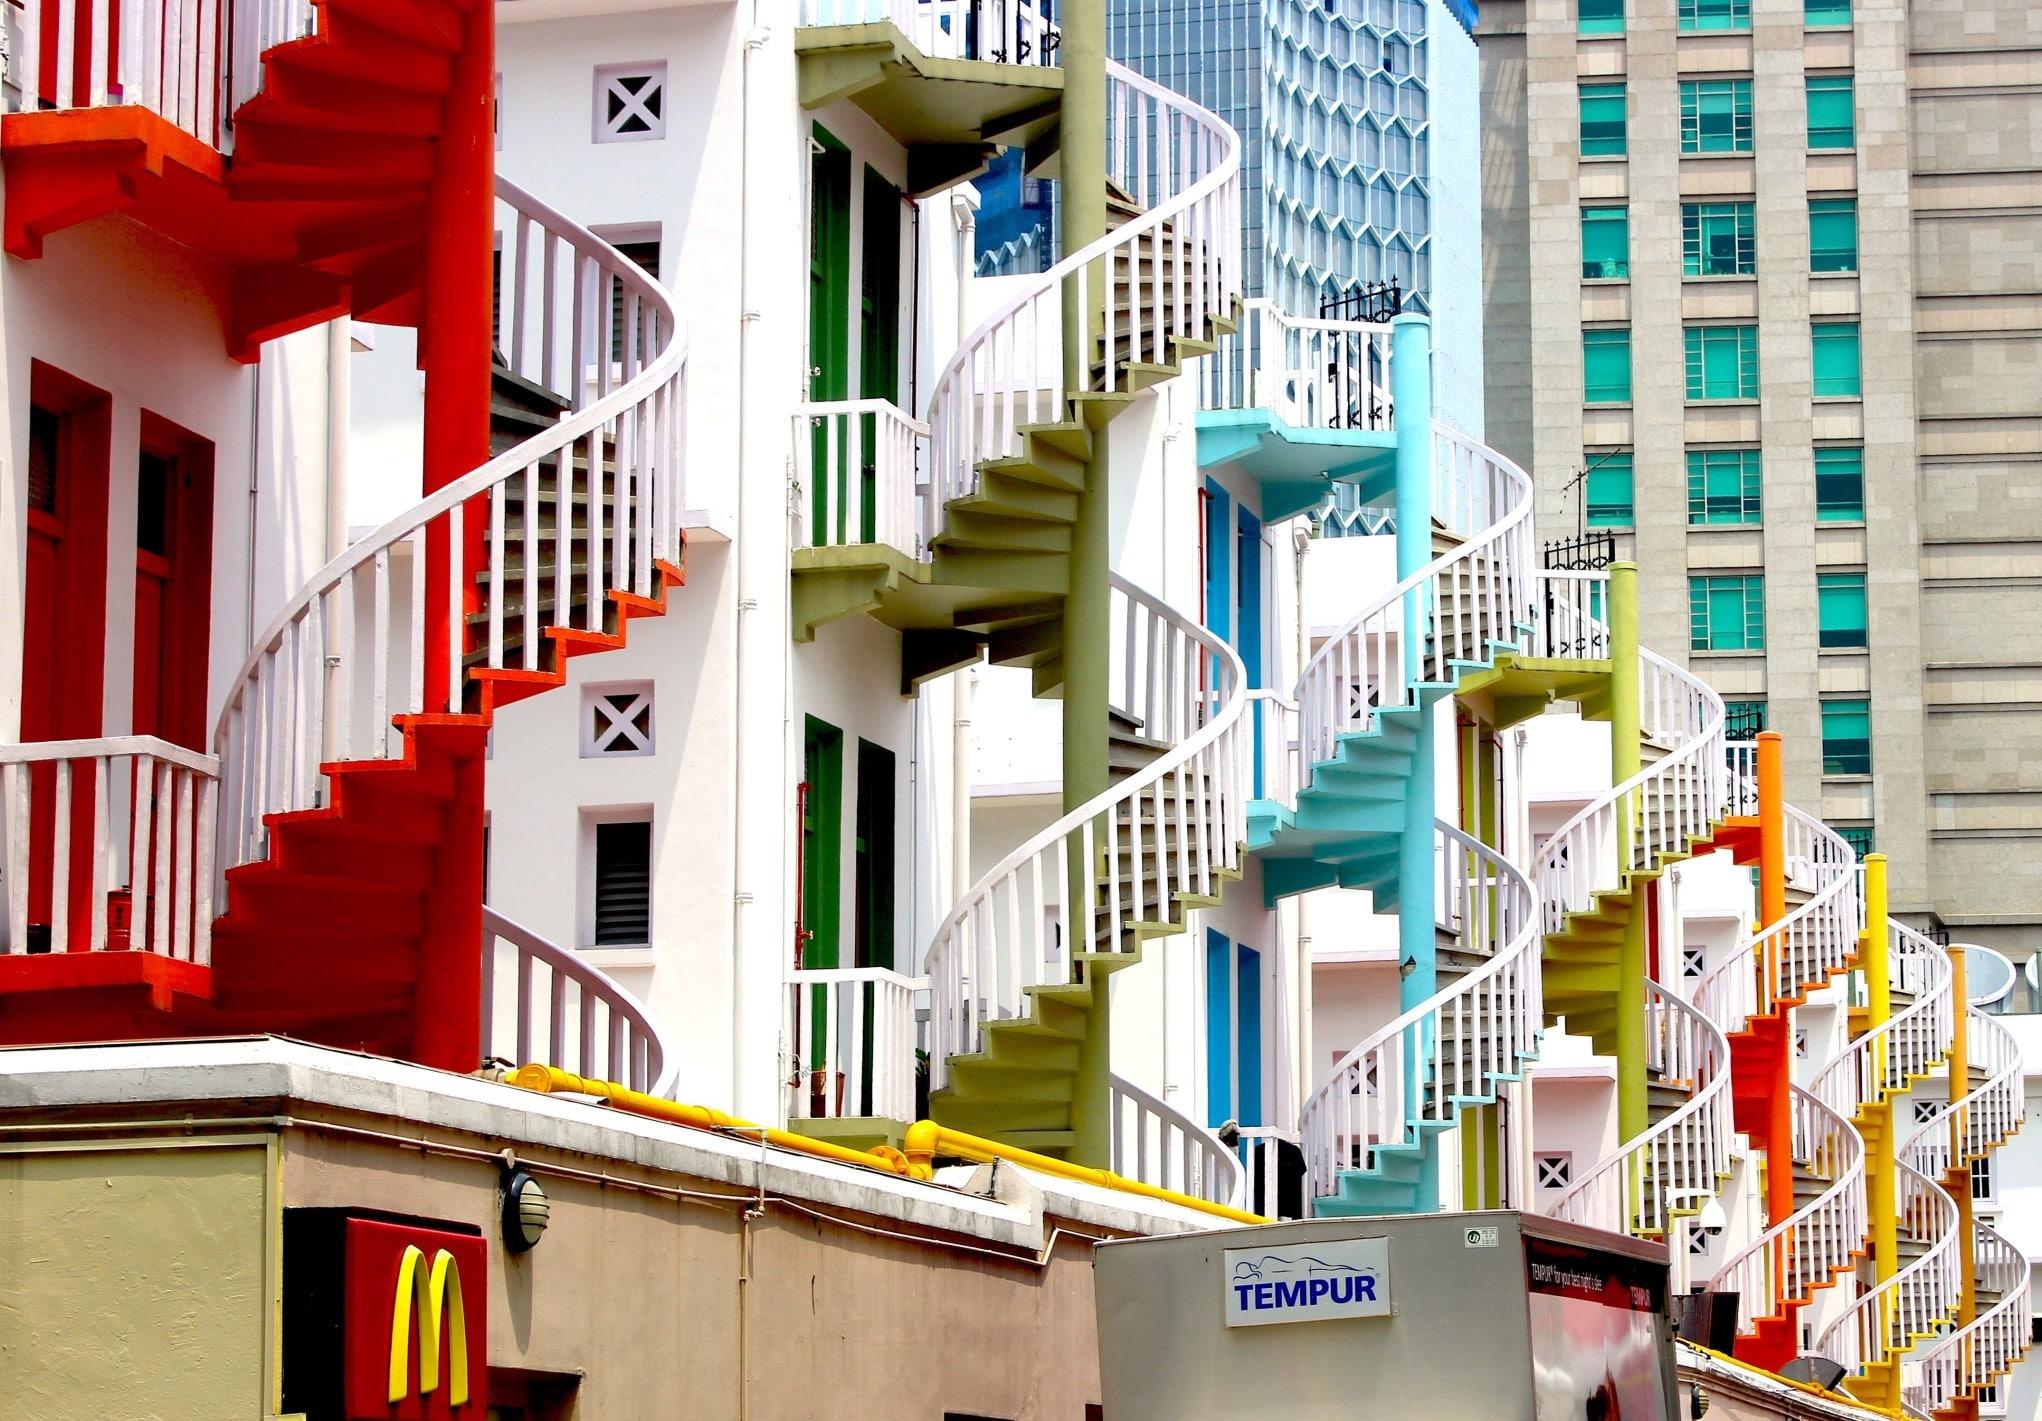 Holz- oder Stahltreppe? Moderne Außentreppen in Singapur. Foto: stanpoh via Twenty20